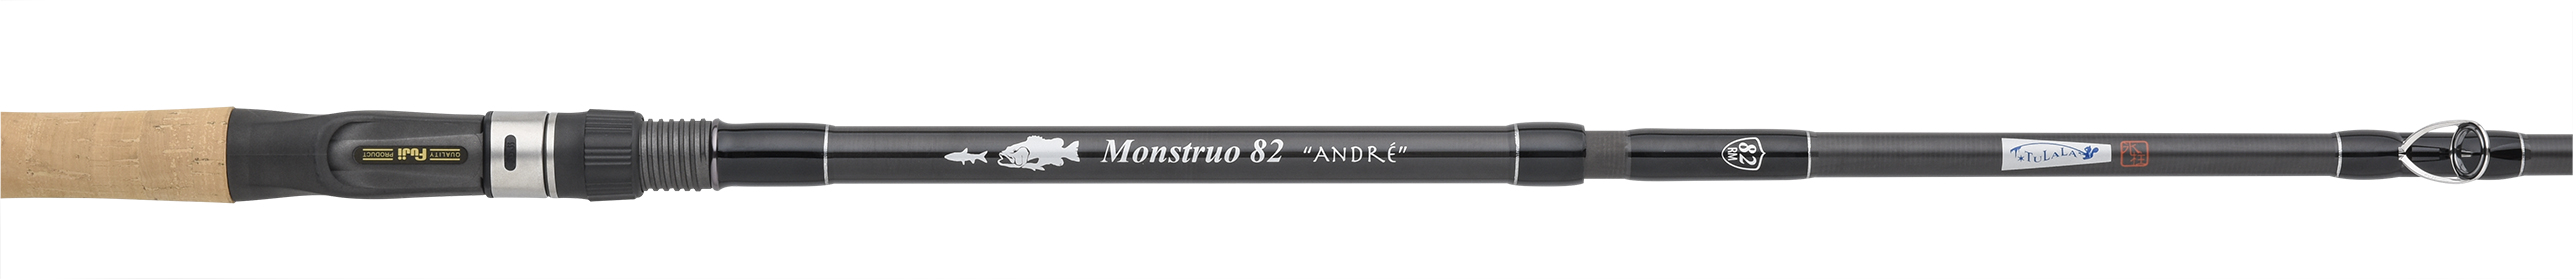 Monstruo 82 ANDRE | ロゴ